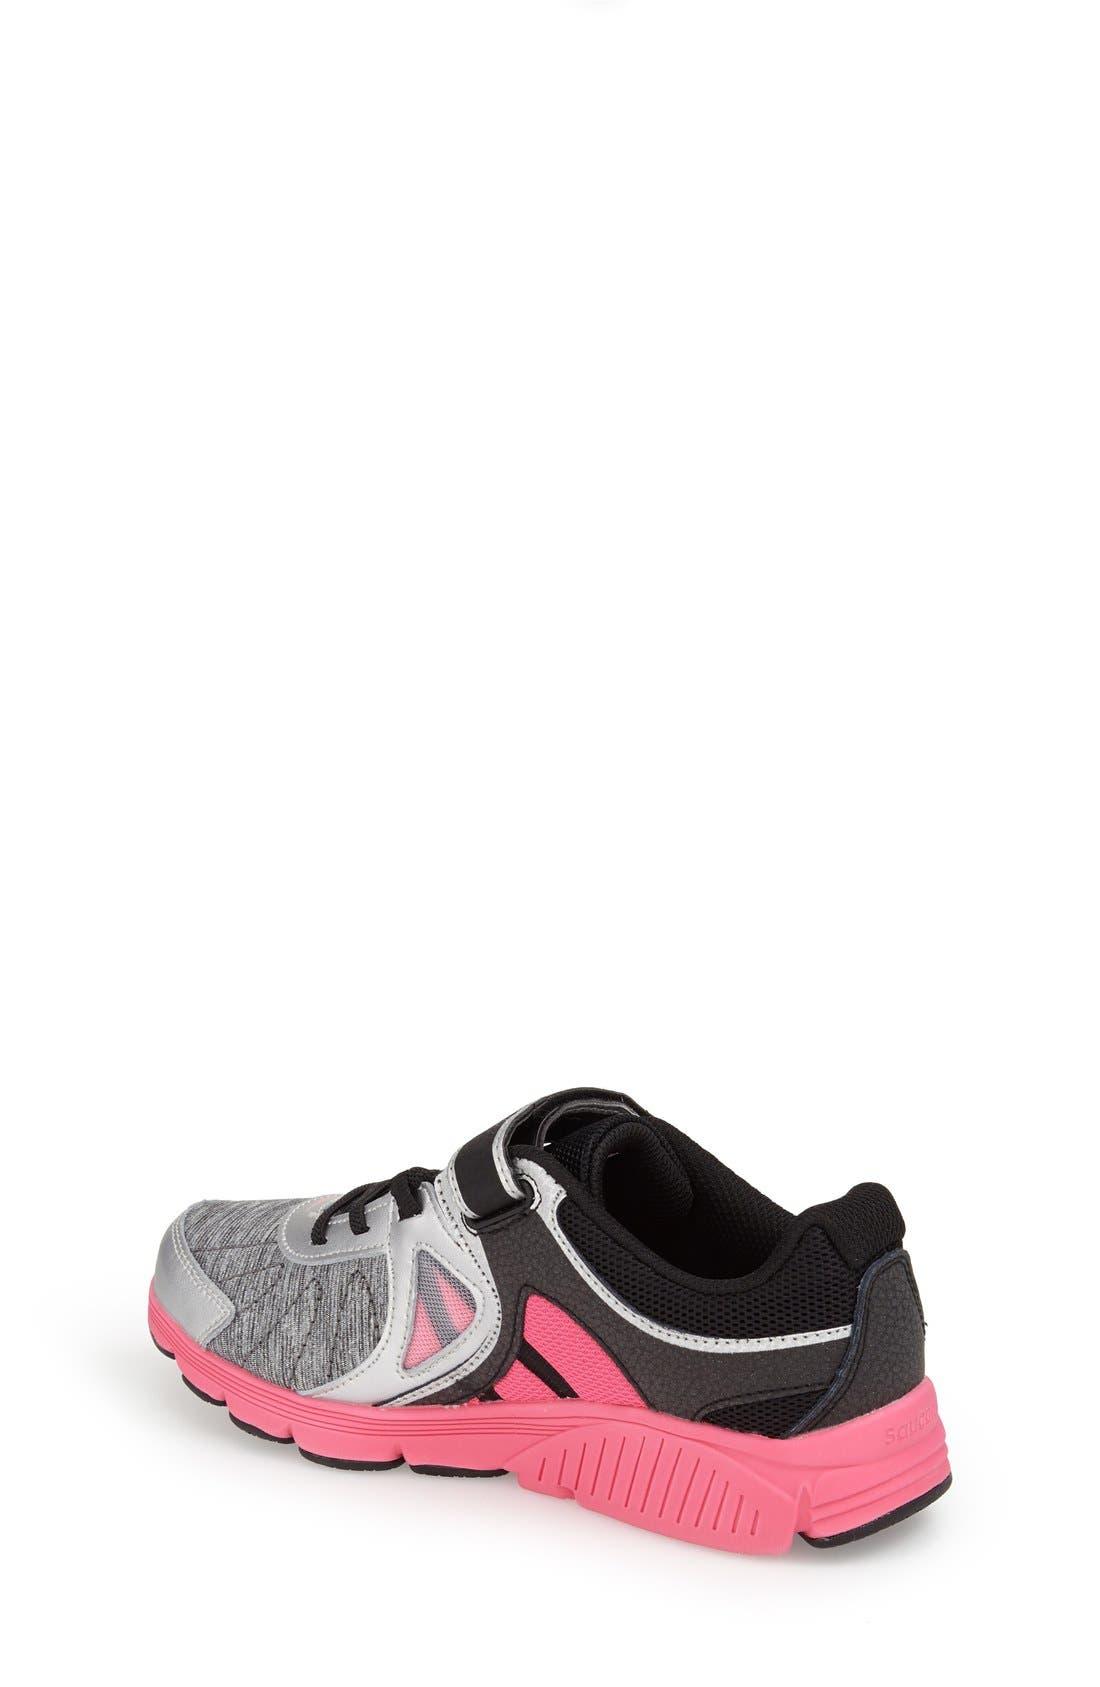 'Kotaro 3 AC' Athletic Sneaker,                             Alternate thumbnail 2, color,                             046